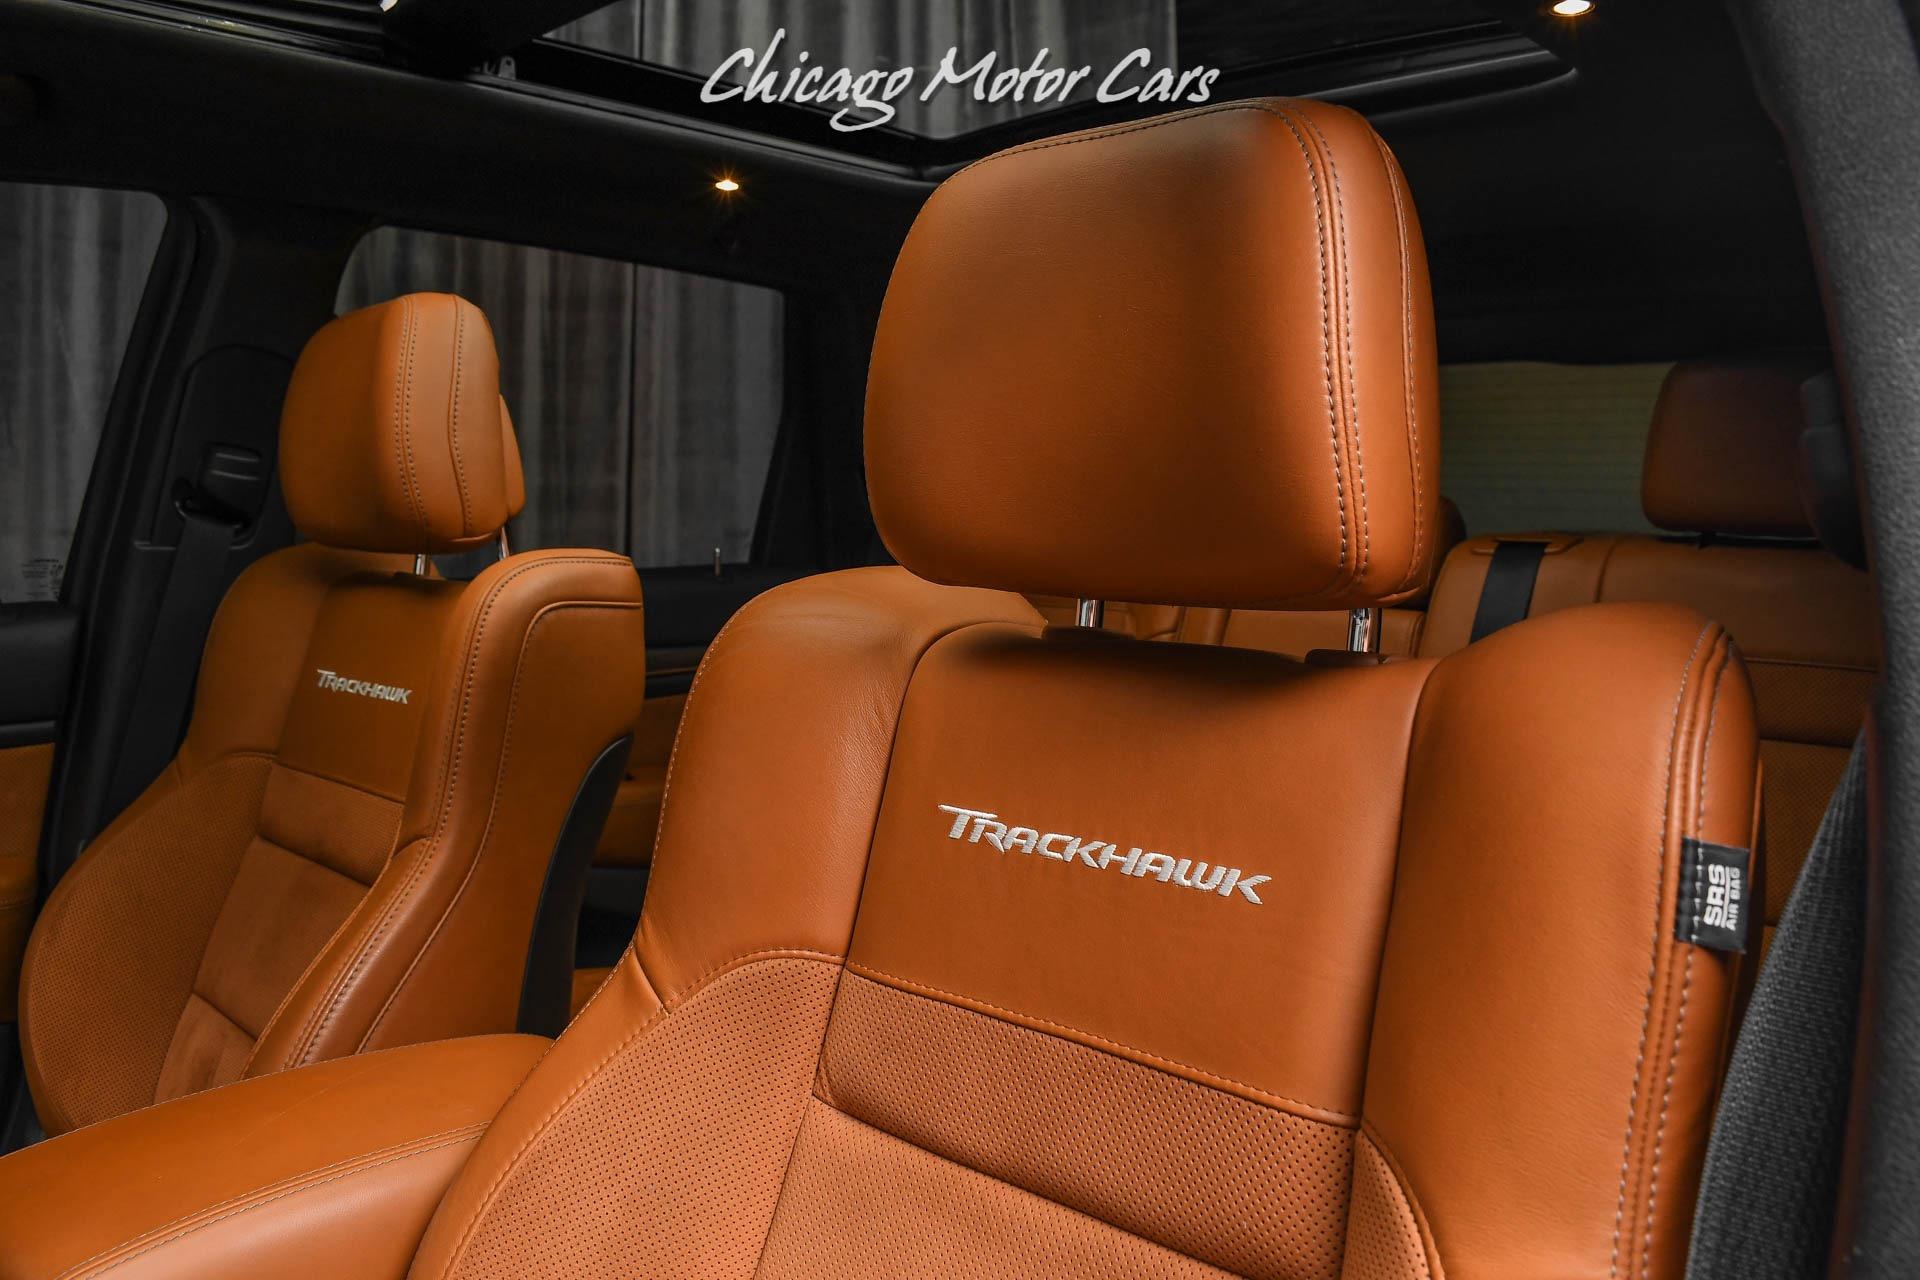 Used-2018-Jeep-Grand-Cherokee-Trackhawk-Dual-Pane-Panoramic-Roof-High-Performance-Audio-707-Horsepower